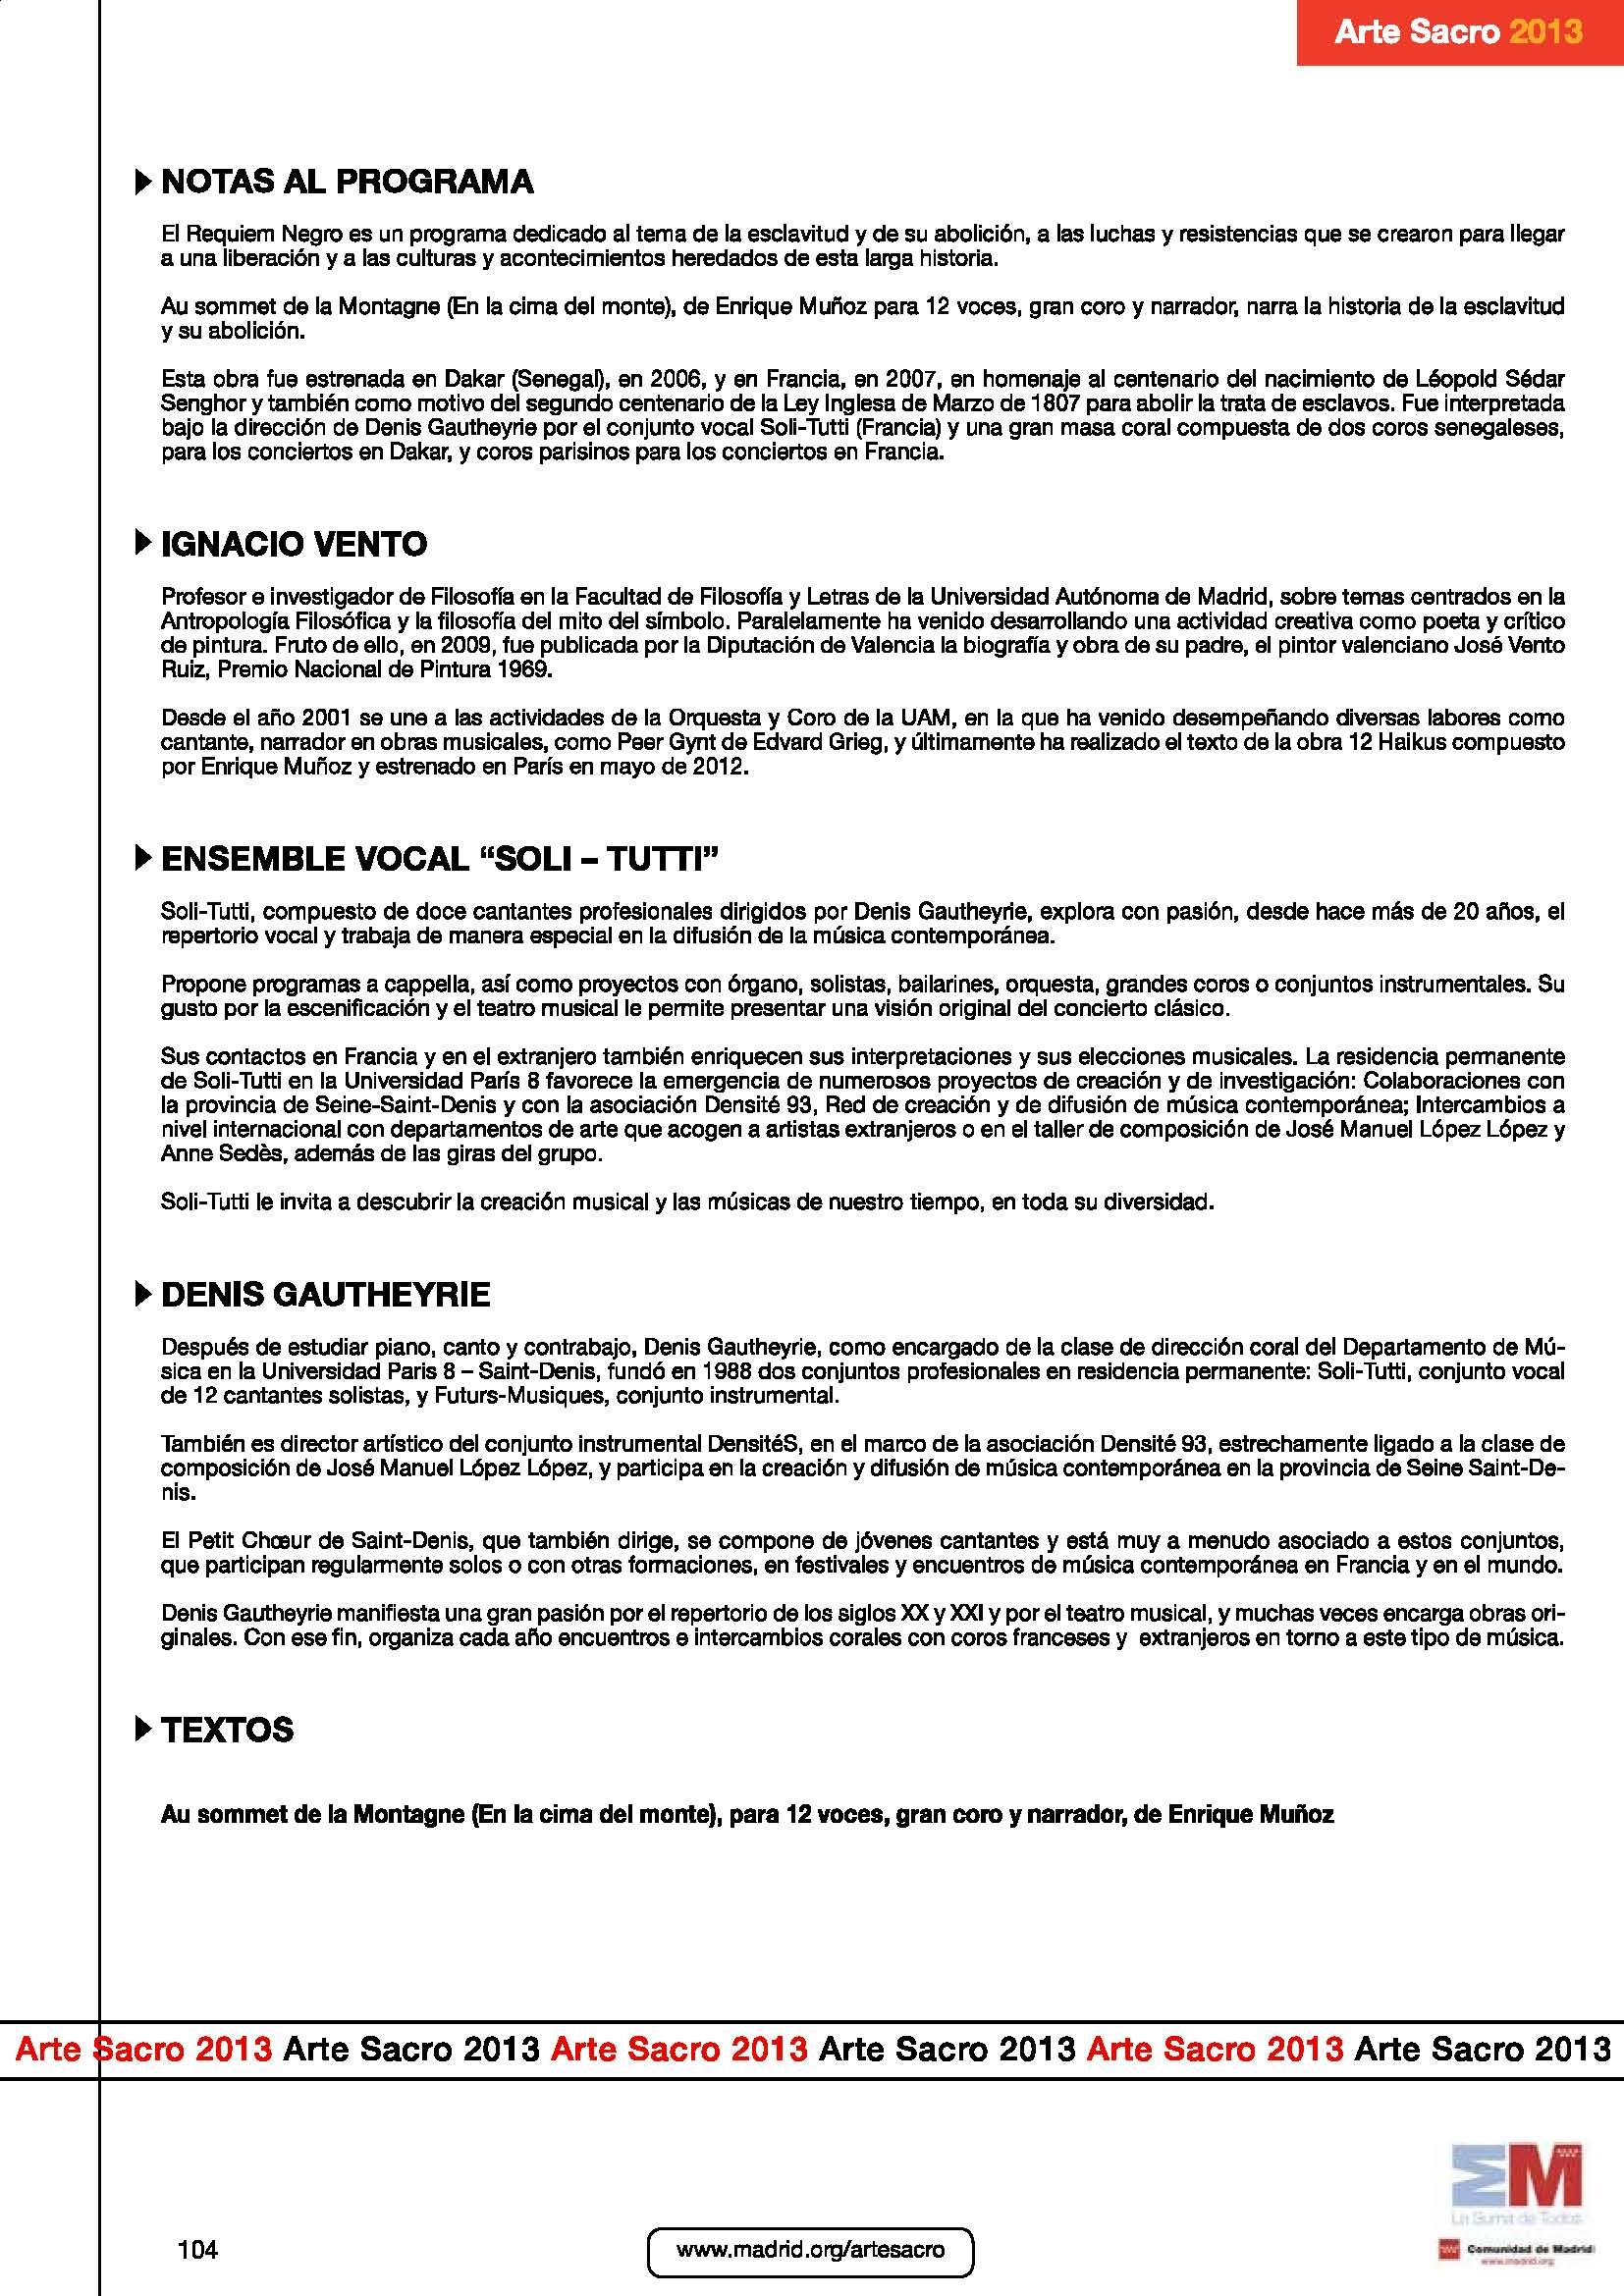 dossier_completo_Página_104